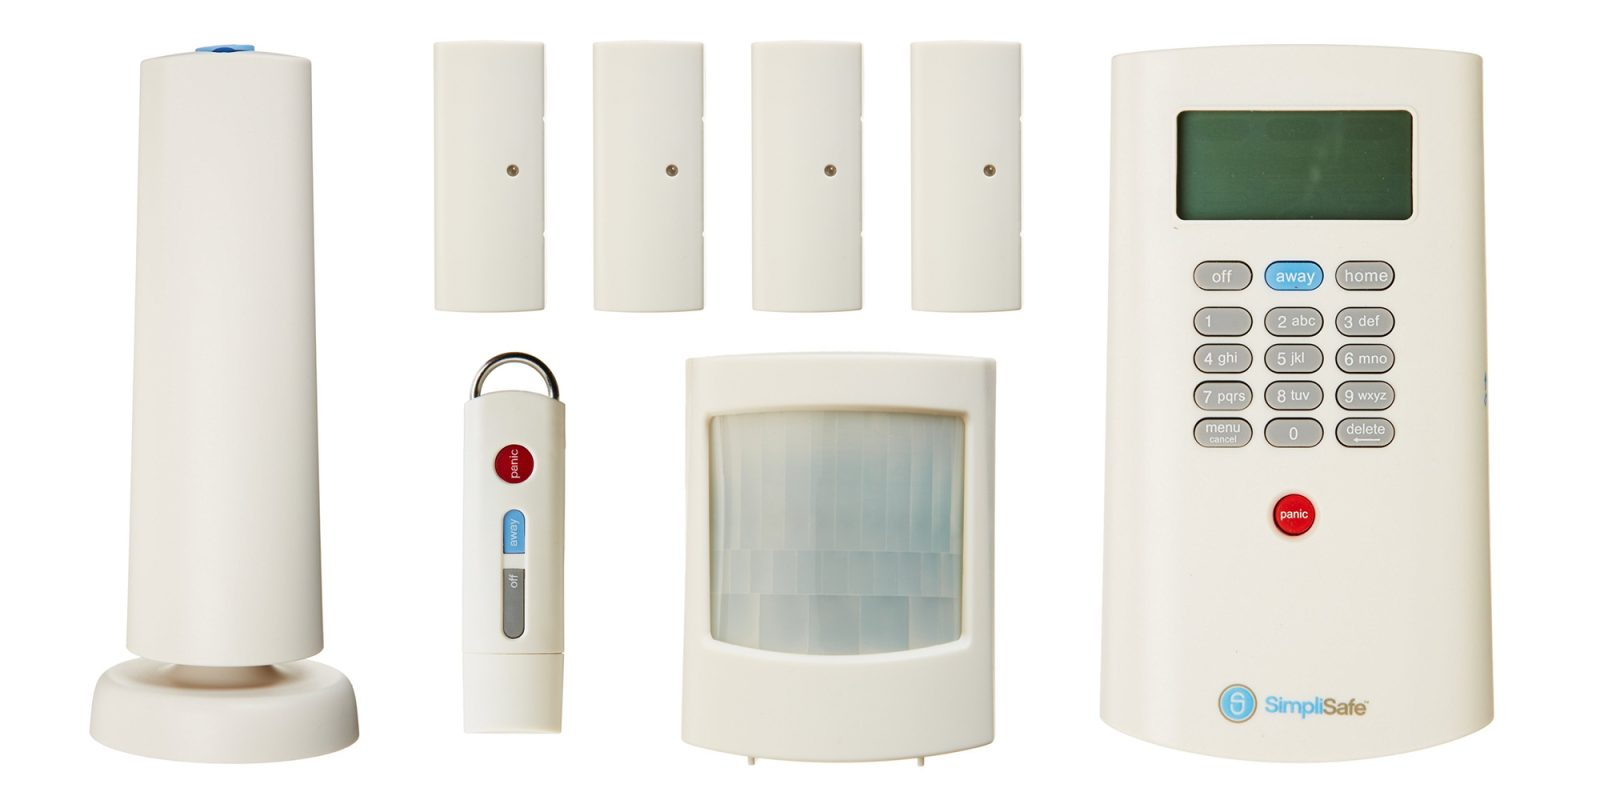 simplisafe-security-system1